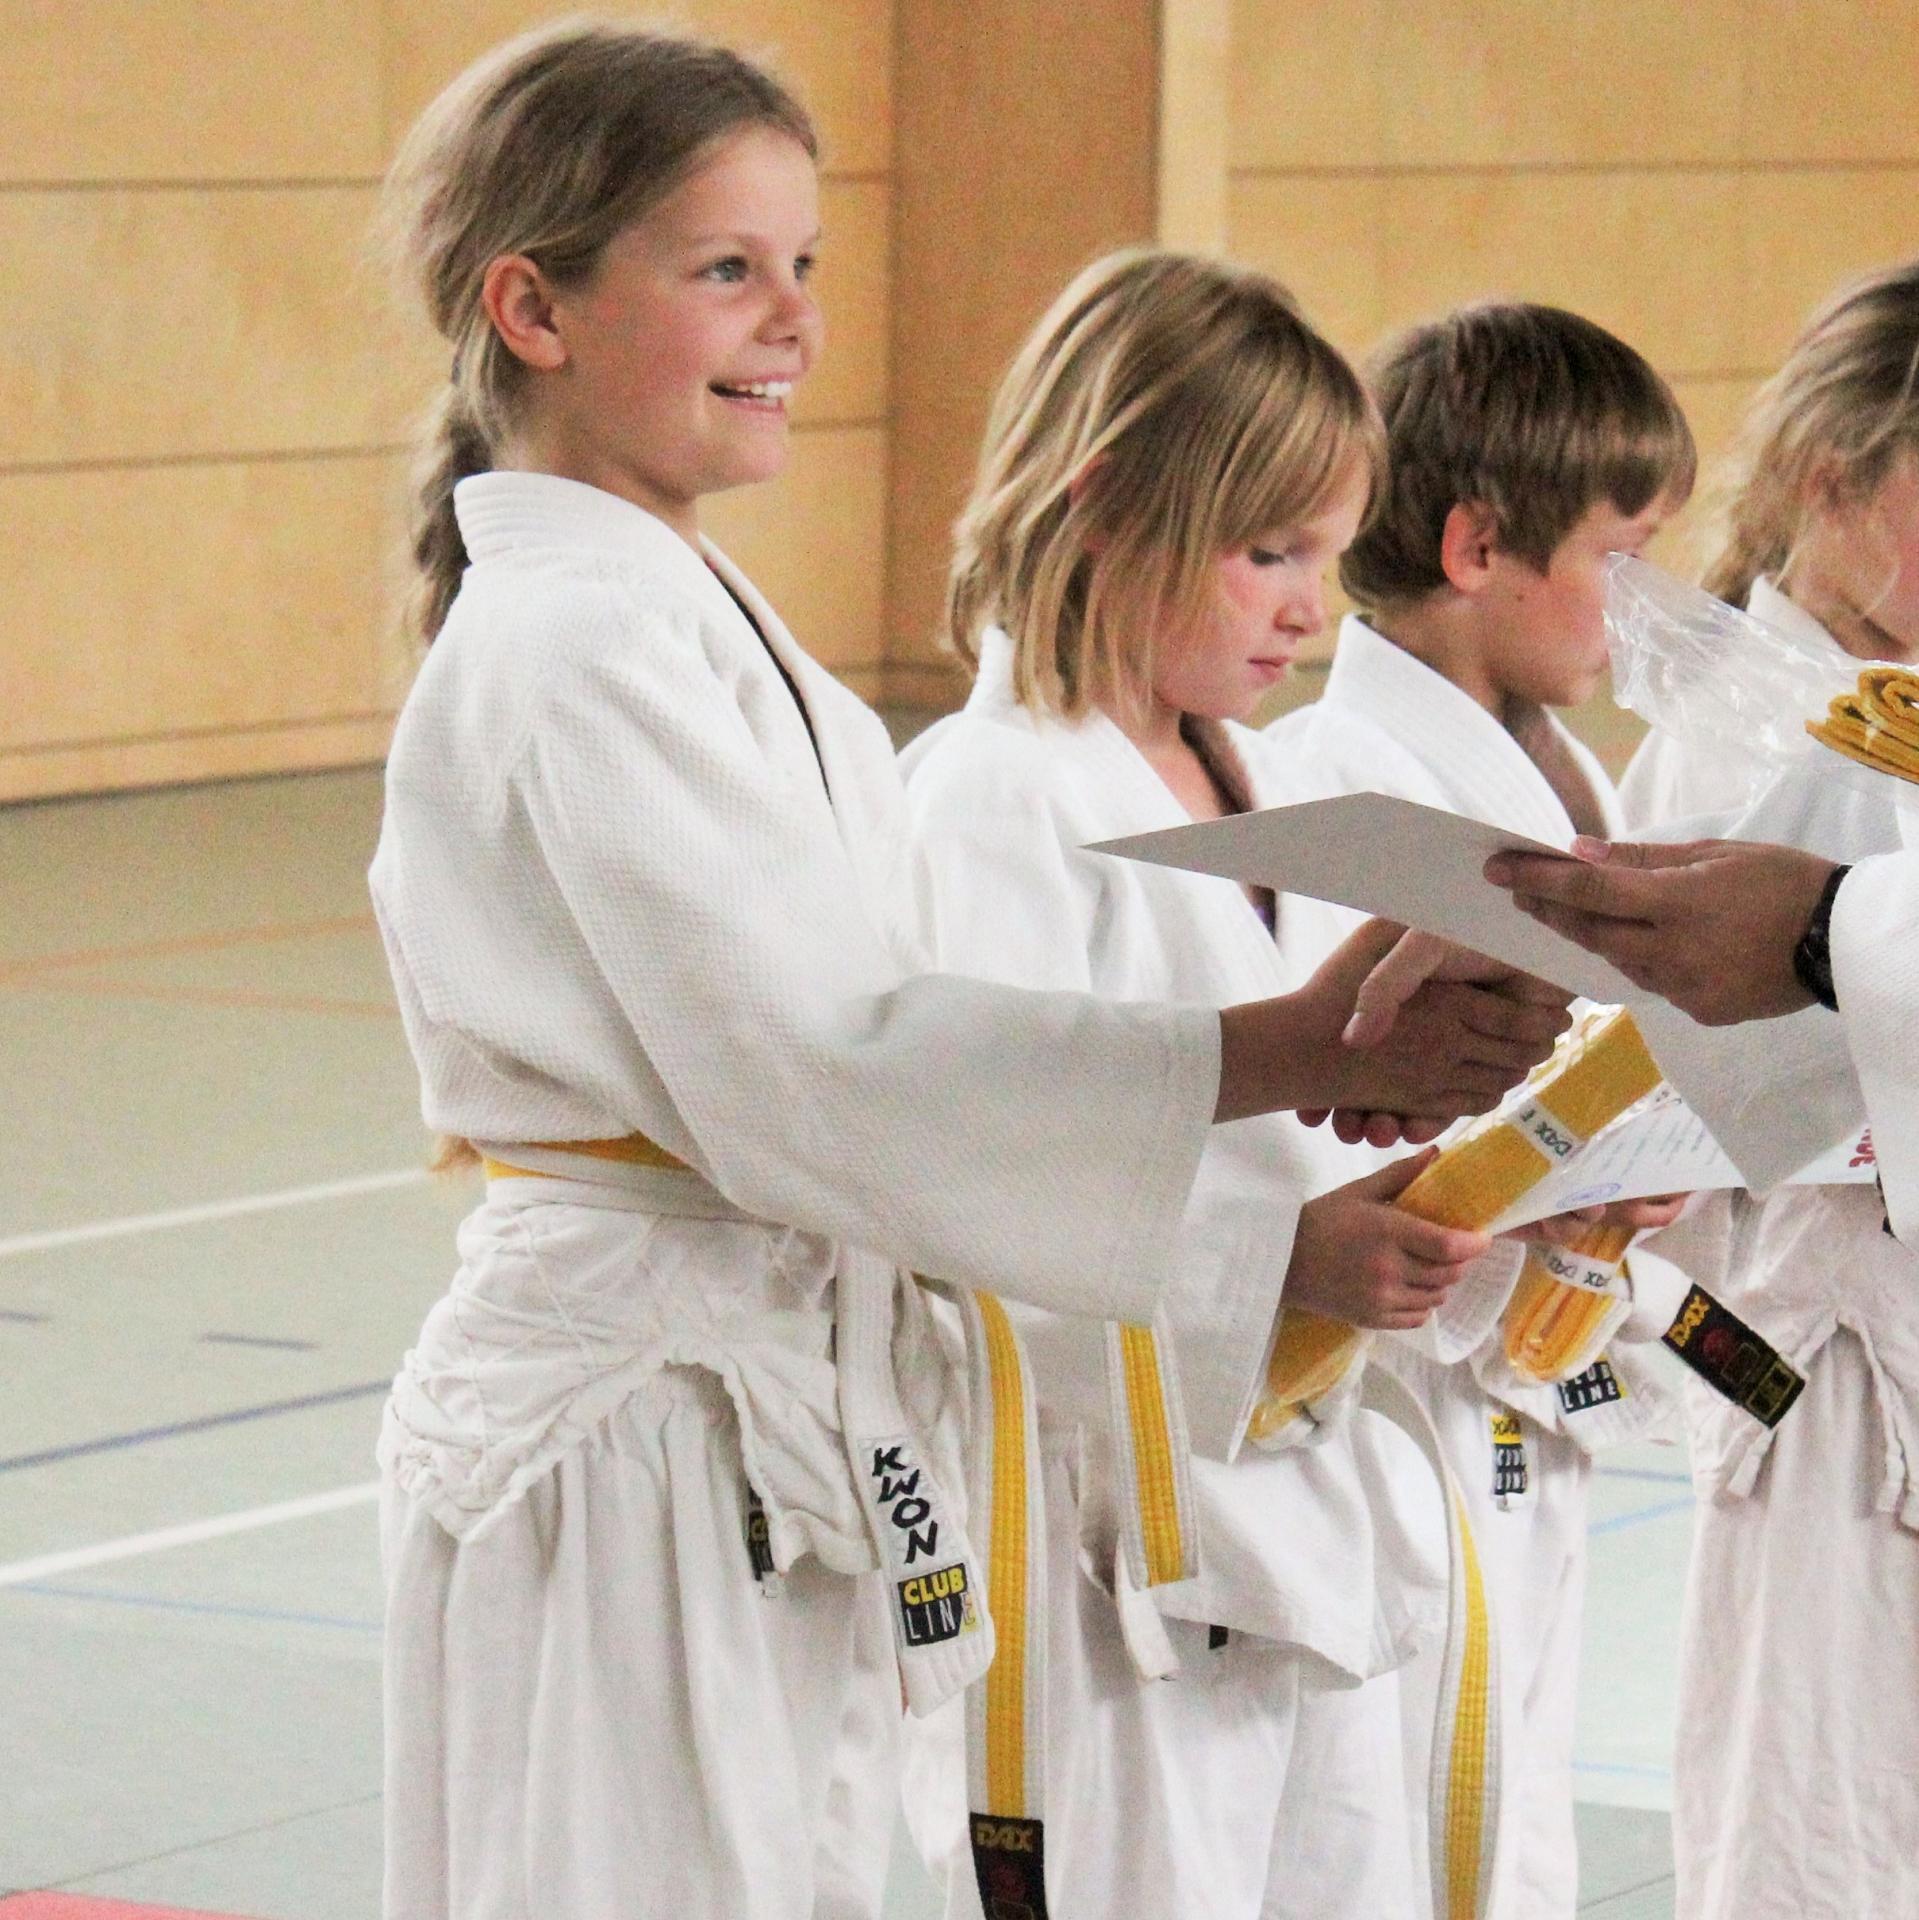 Judo Urkundenübergabe